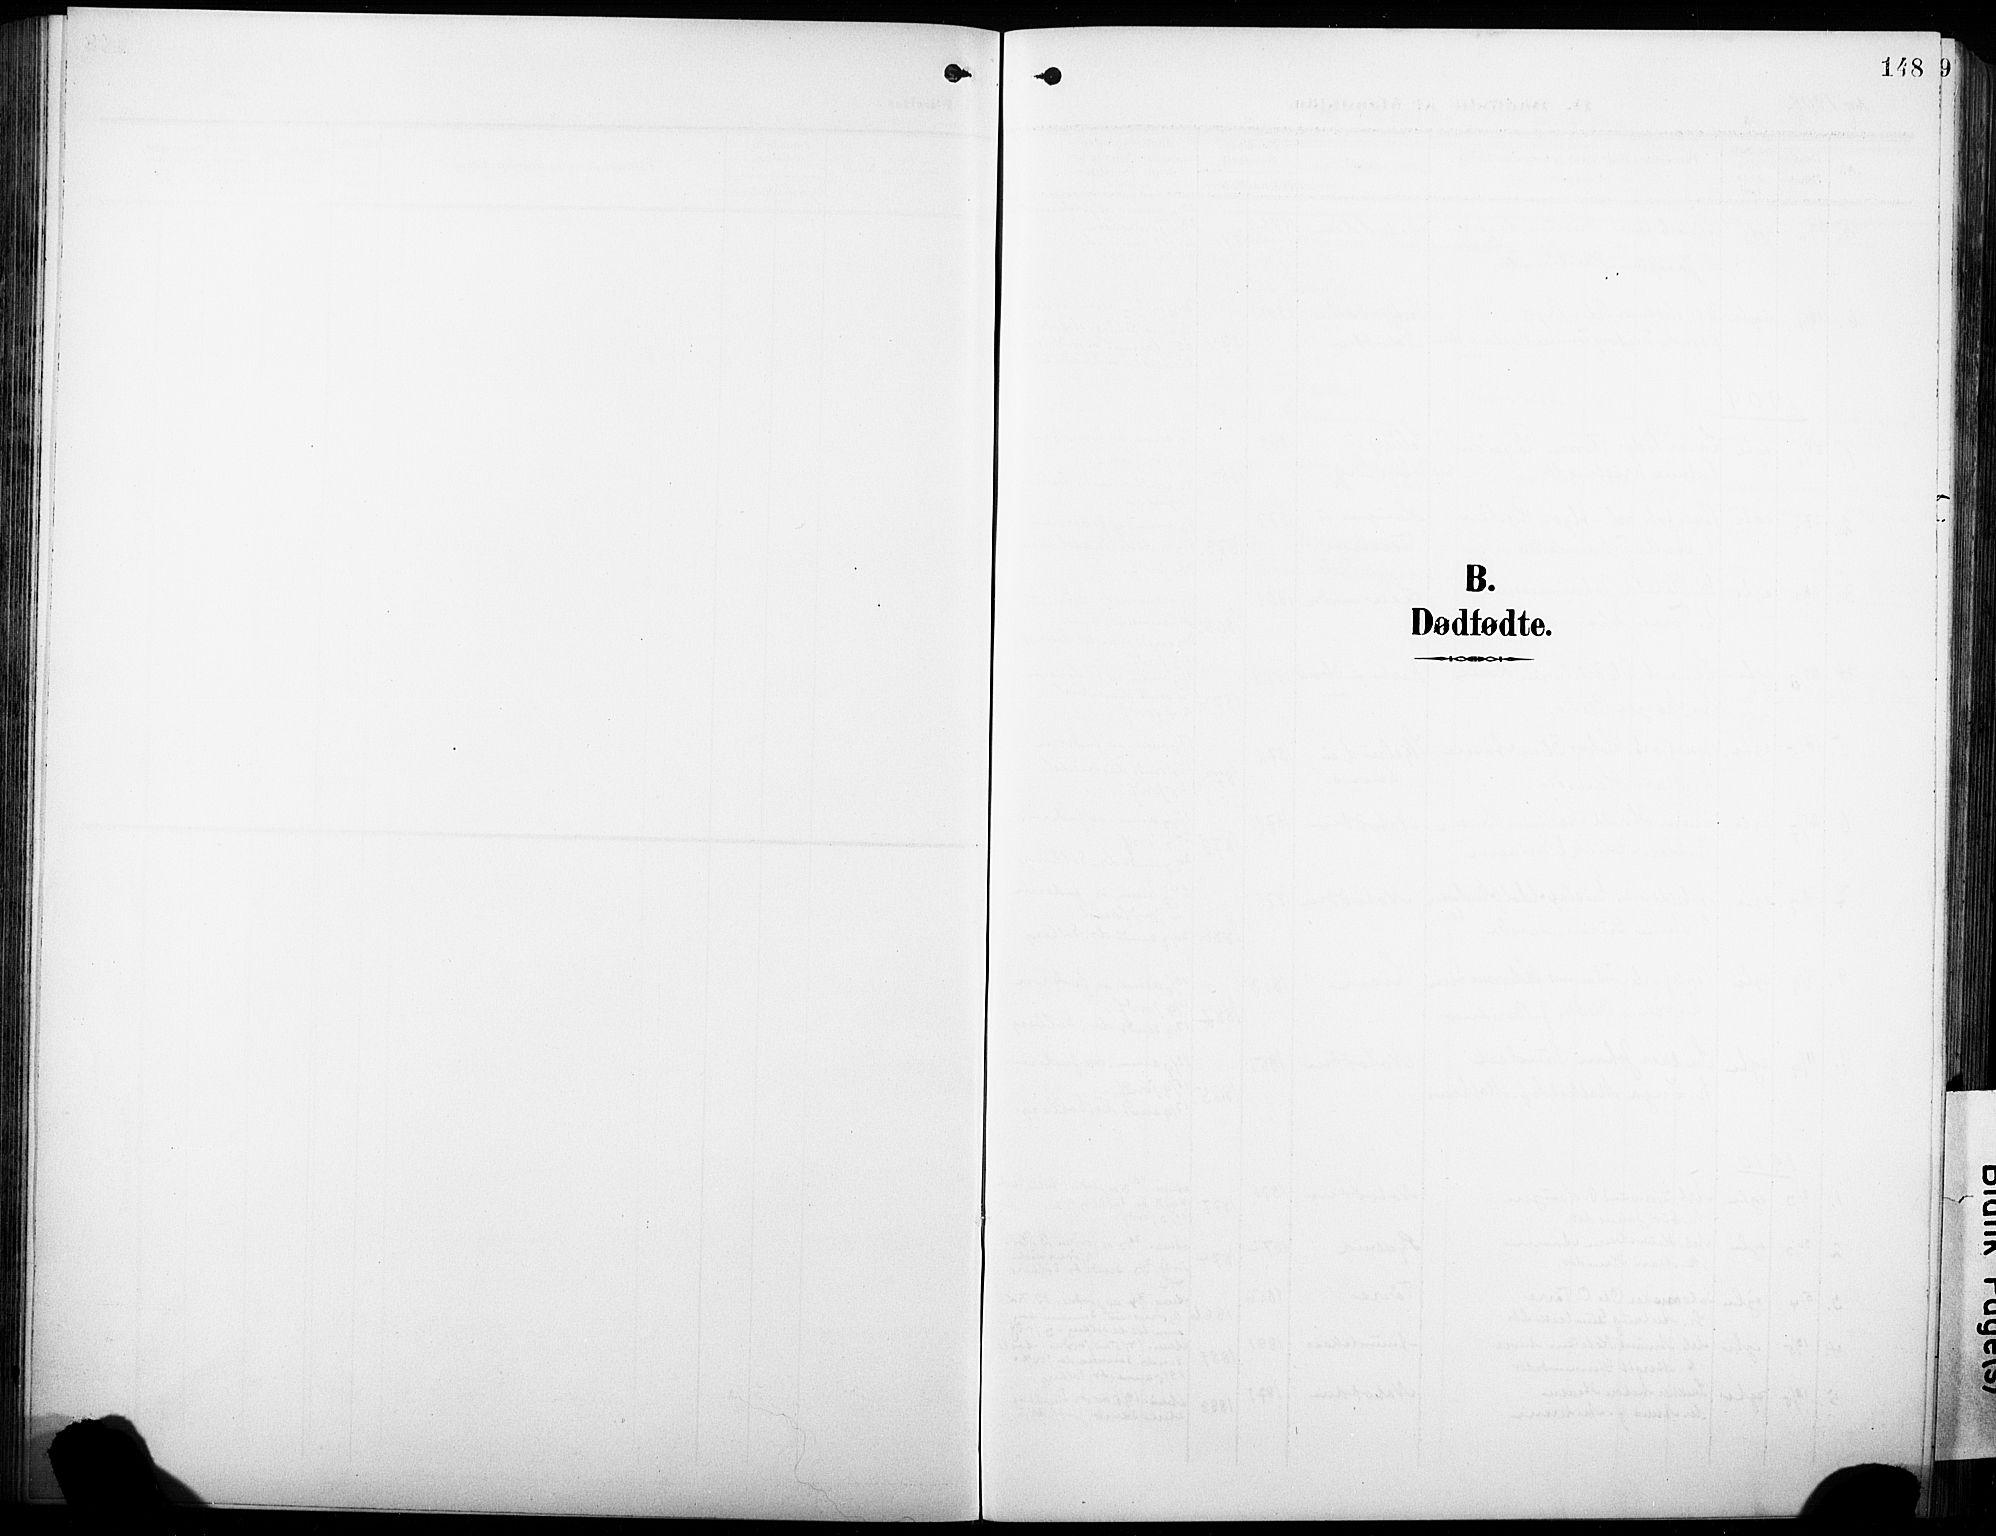 SAKO, Heddal kirkebøker, G/Ga/L0003: Klokkerbok nr. I 3, 1908-1932, s. 148